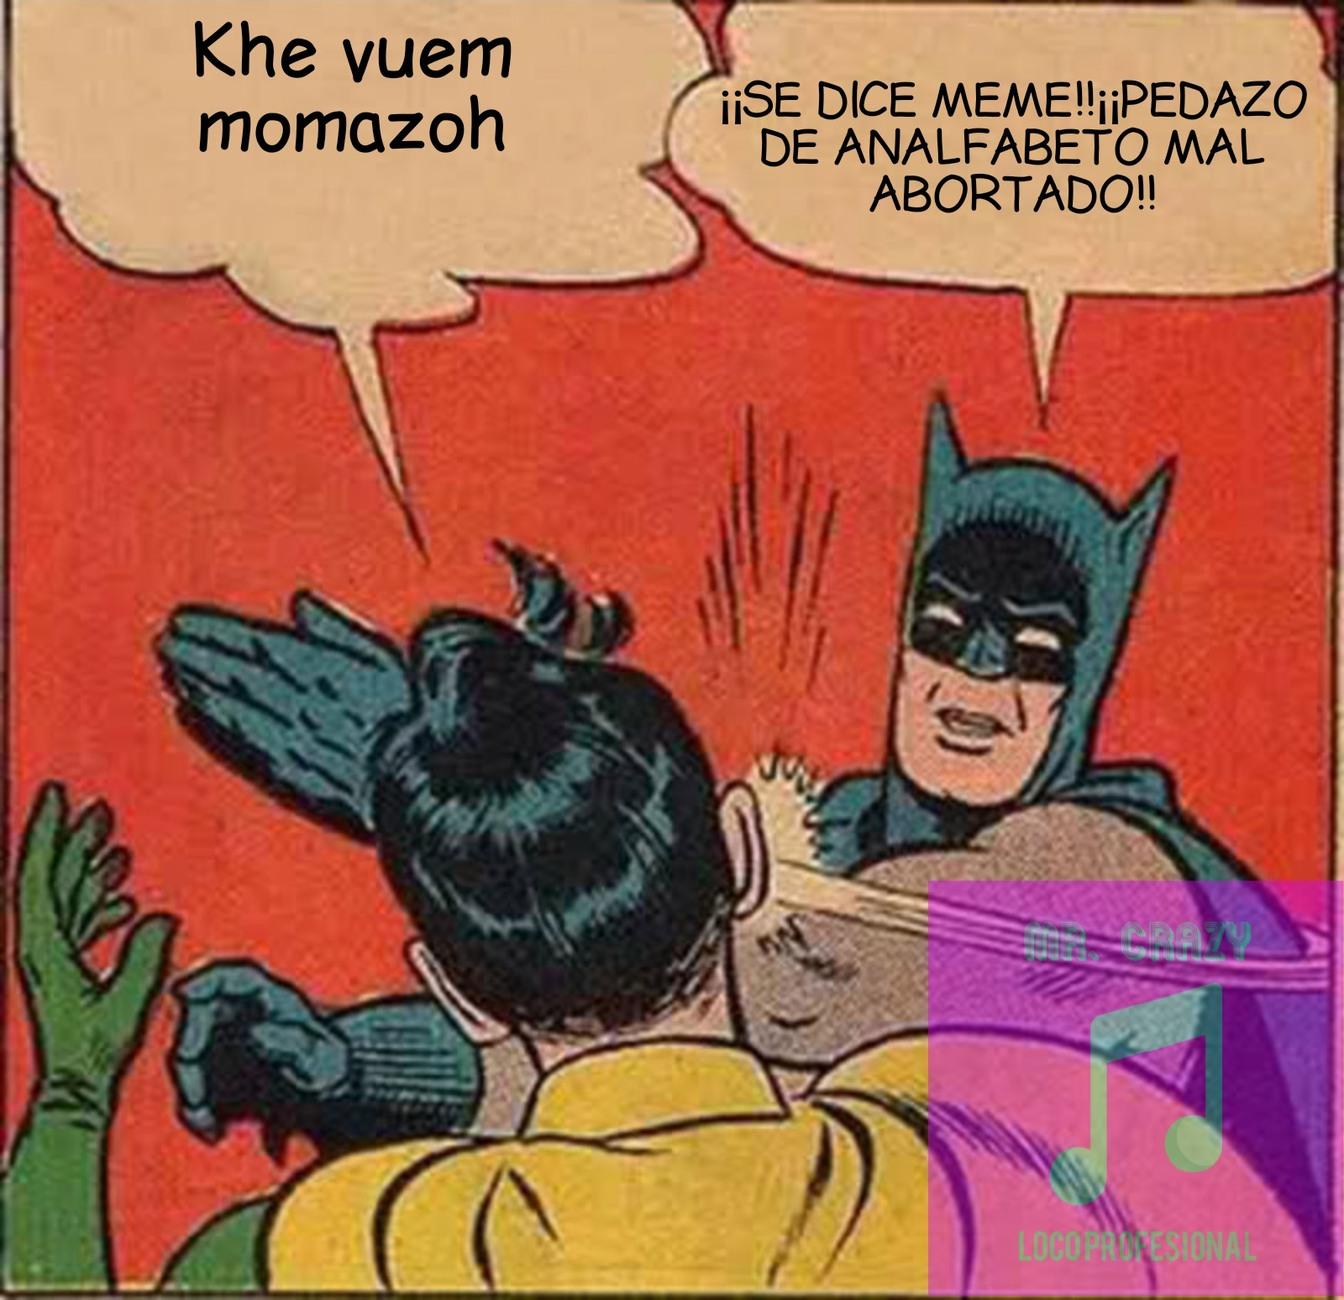 #grasaoff - meme